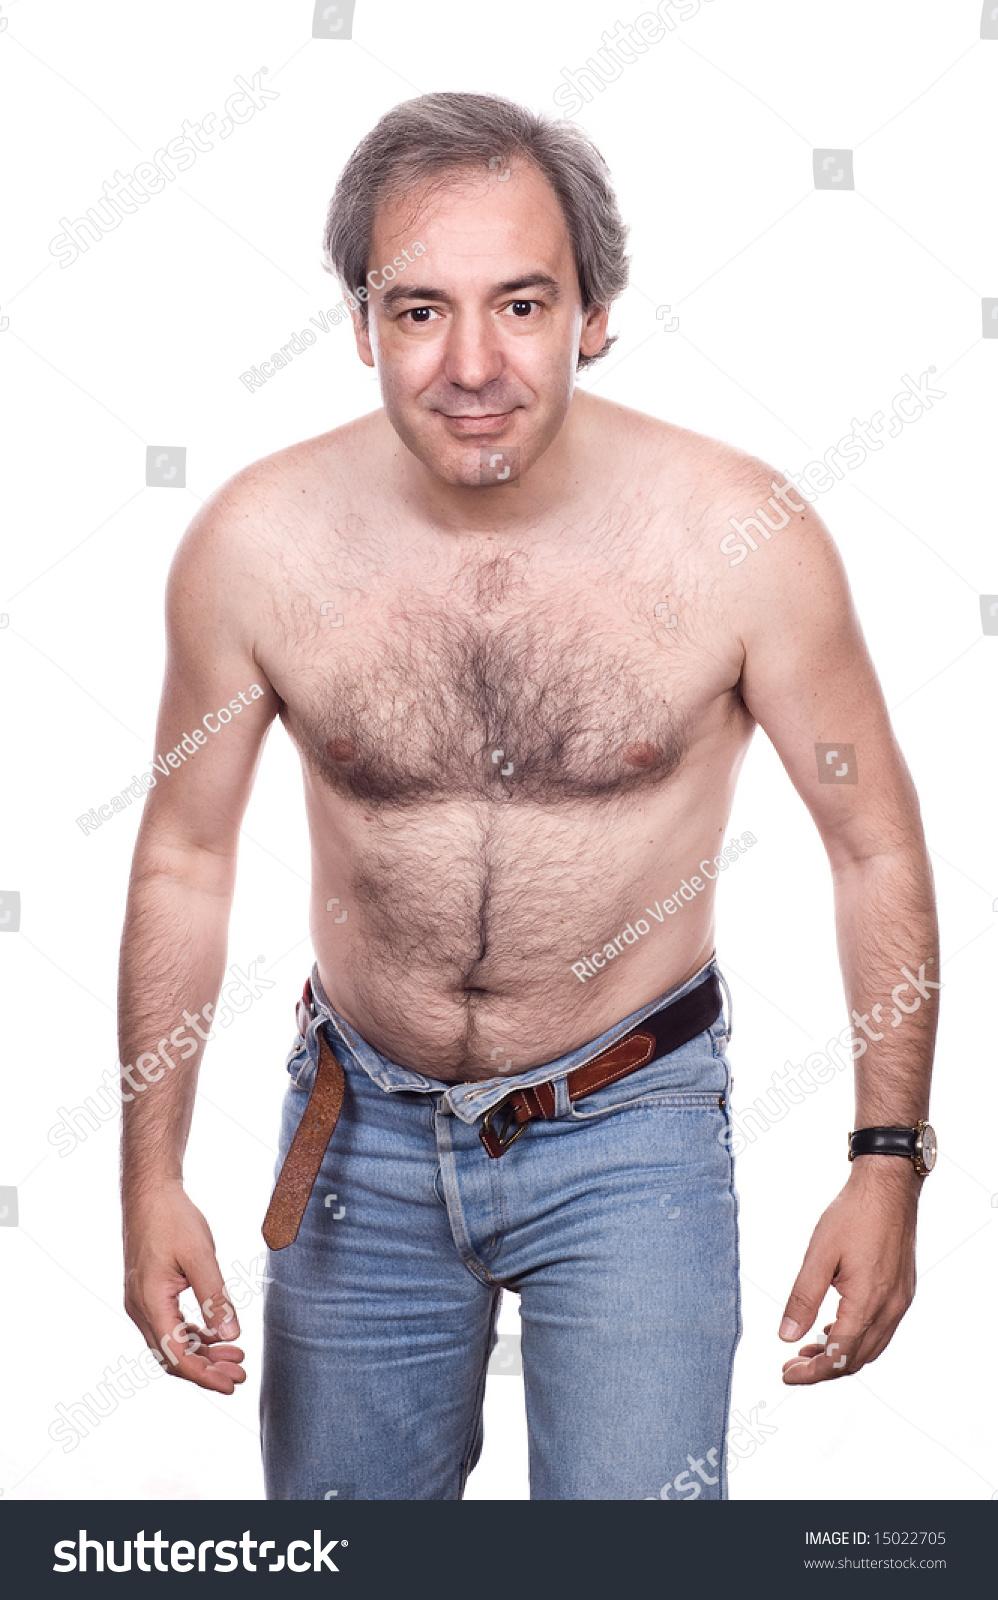 Bbw mature granny nude